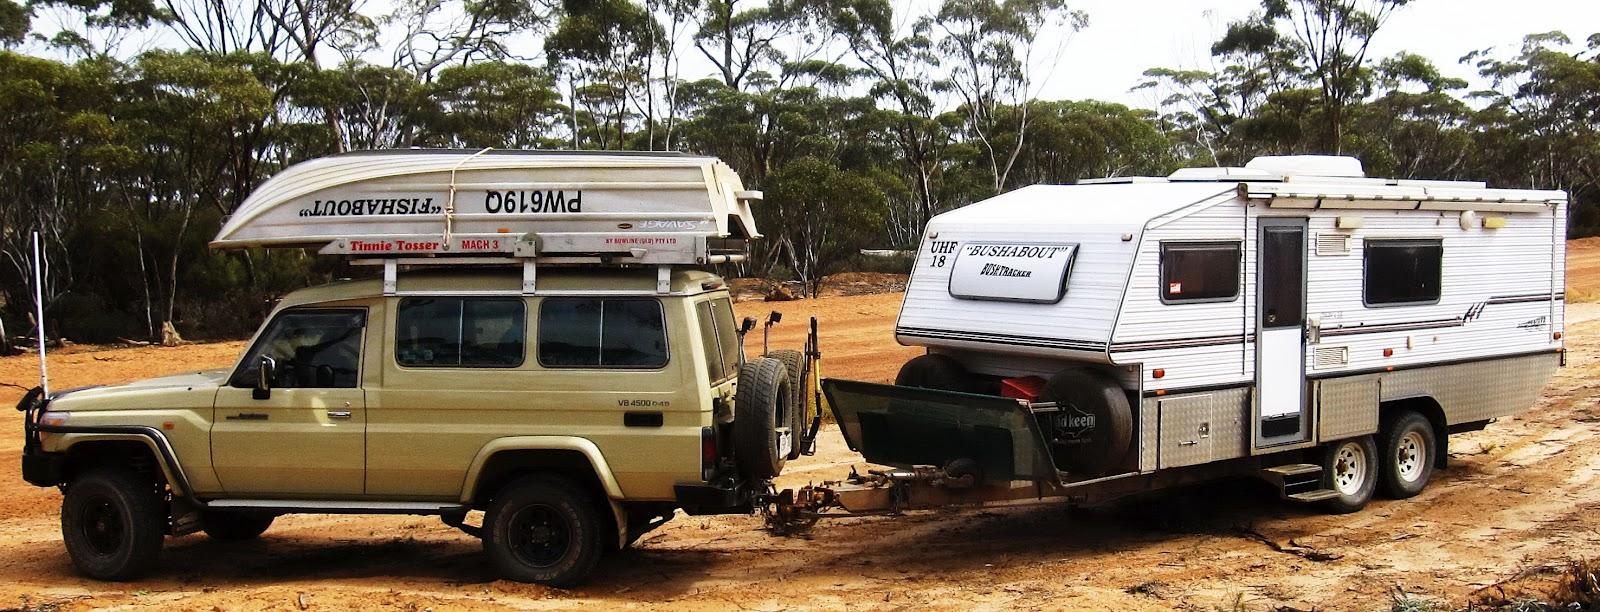 Elegant  GIBSON 1339 Cutaway Custom OffRoad RV Towing Caravans Specification